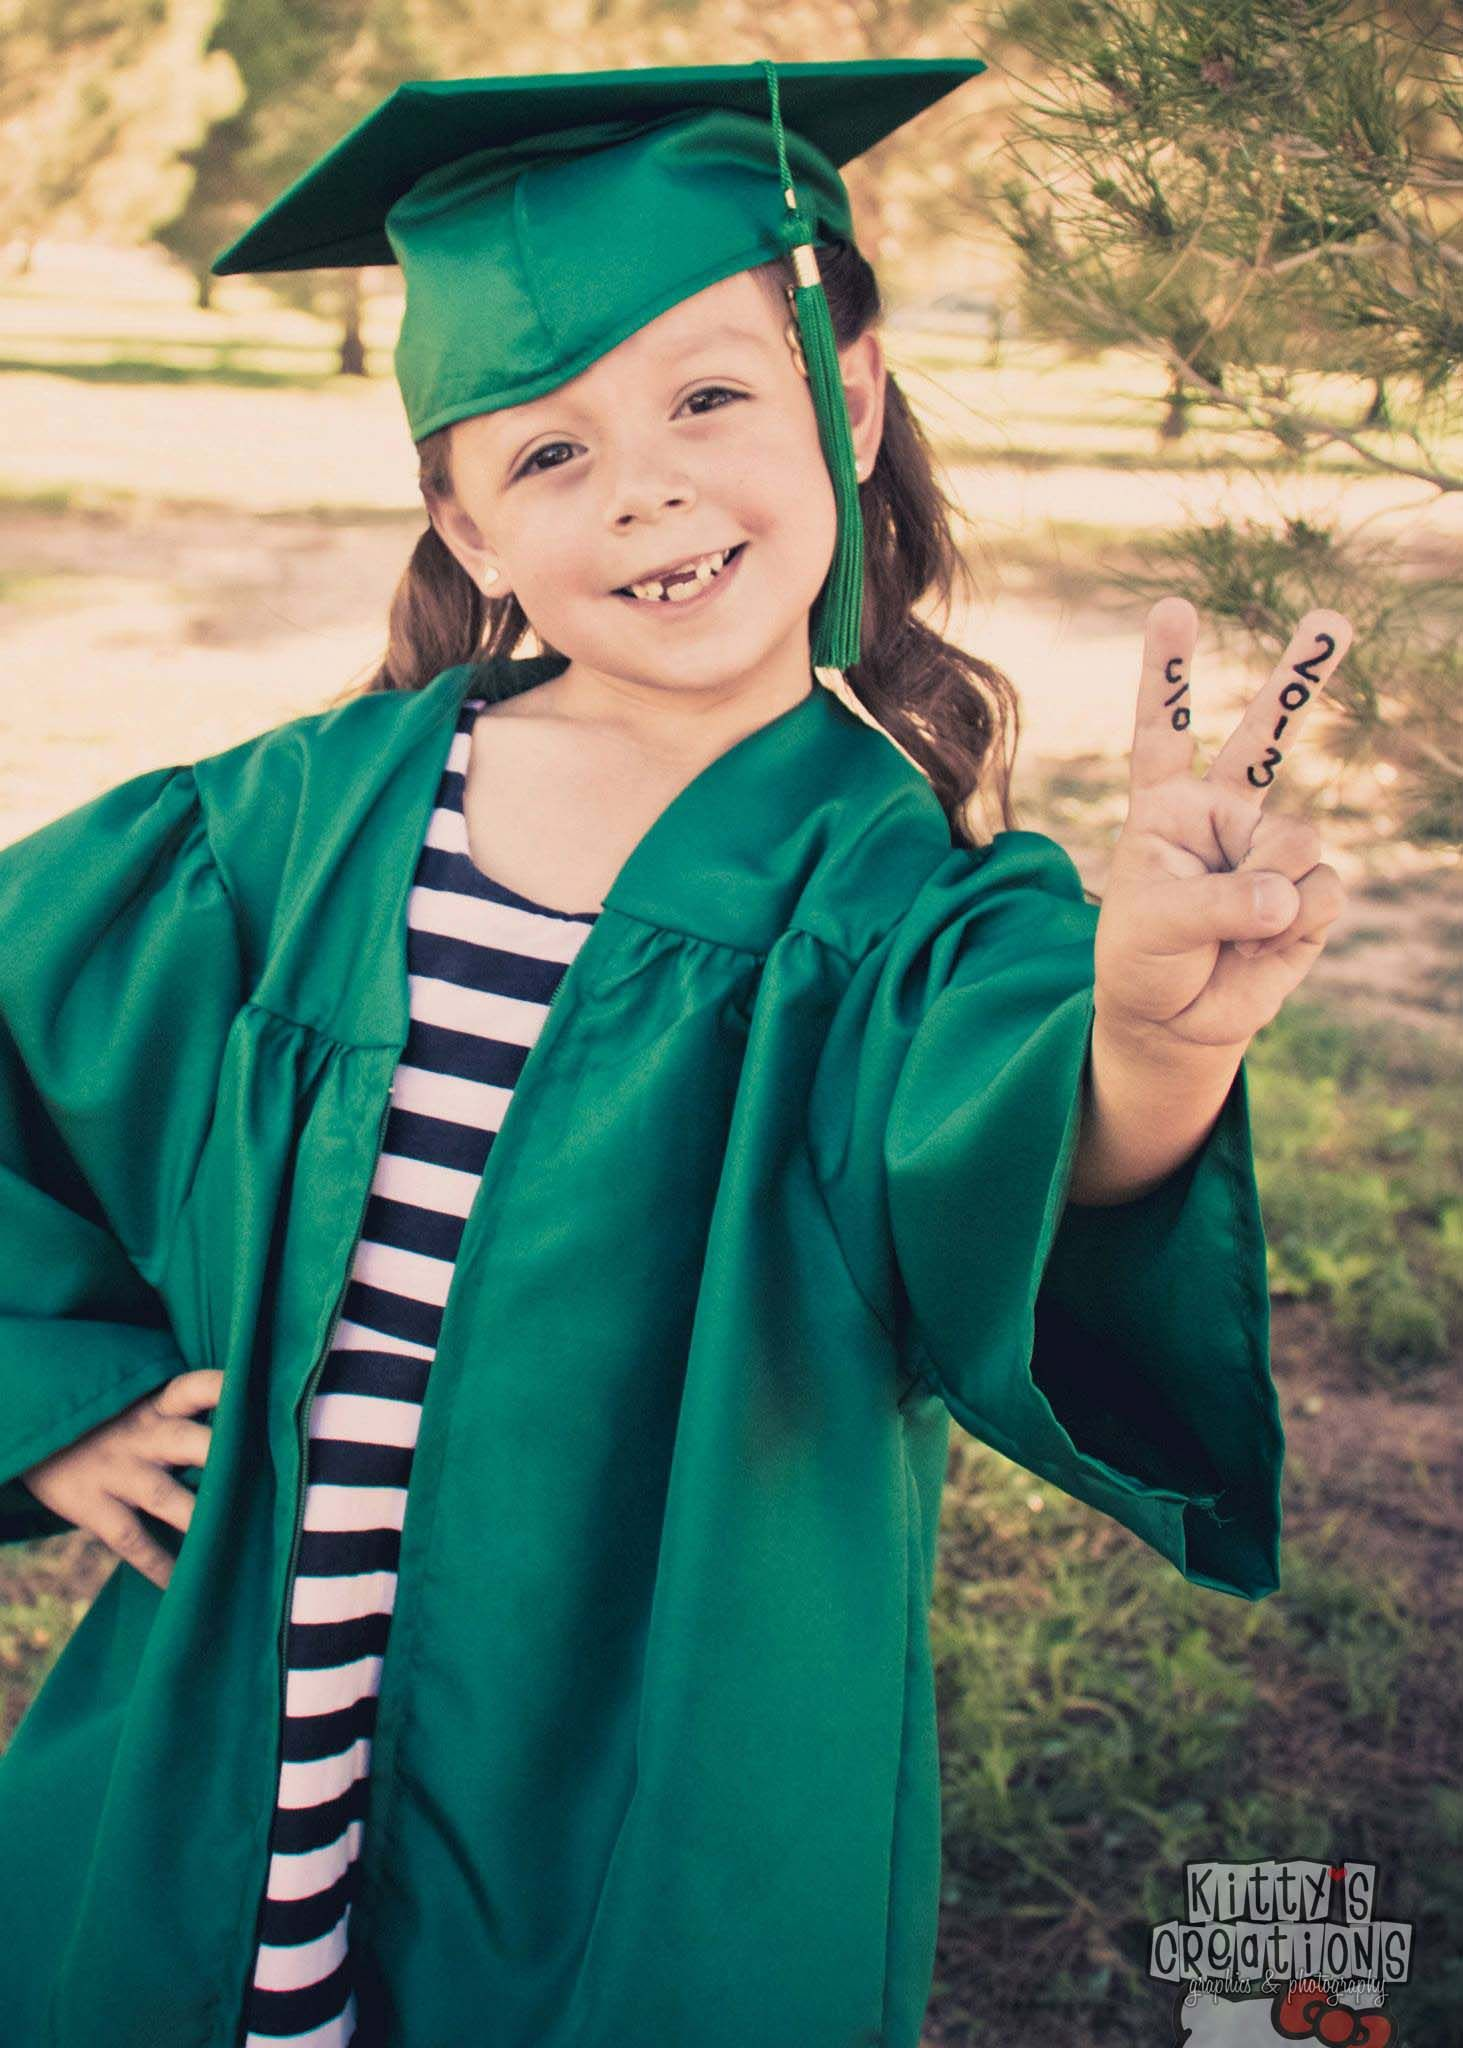 Cap and gown for kindergarten - Kindergarten Graduation Photo Idea Children S Photography